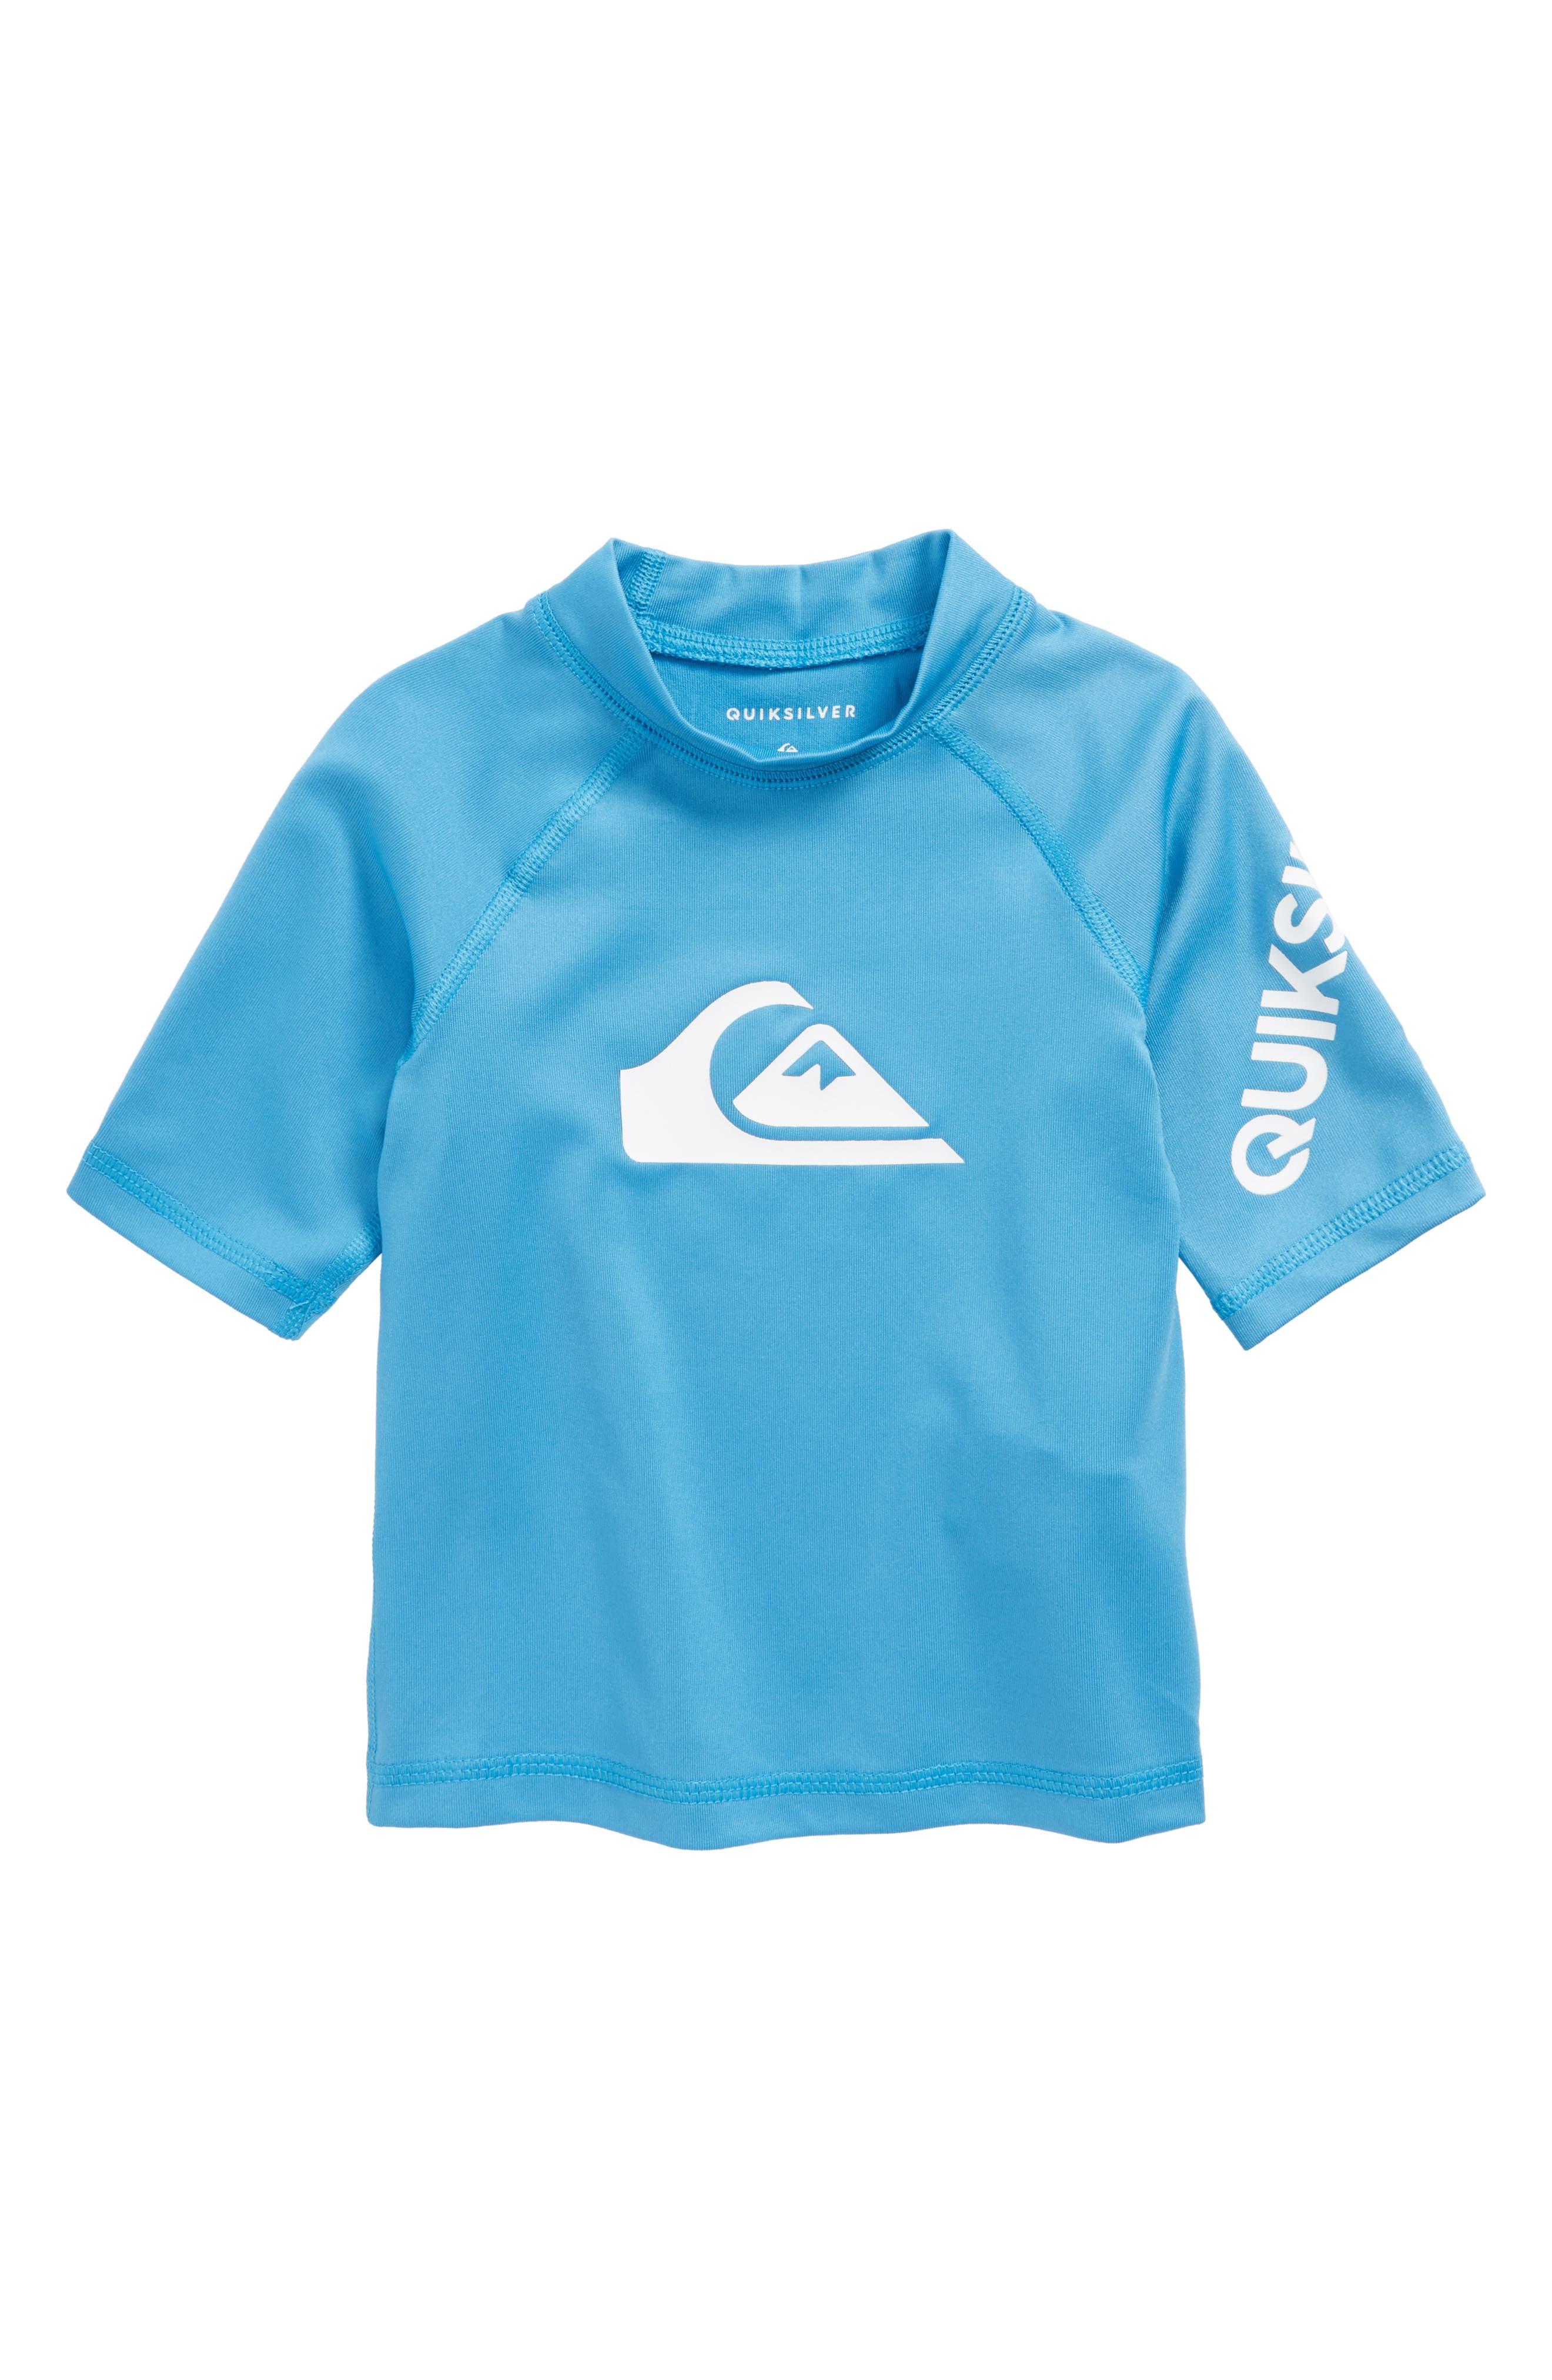 Logo Rashguard Shirt,                         Main,                         color,